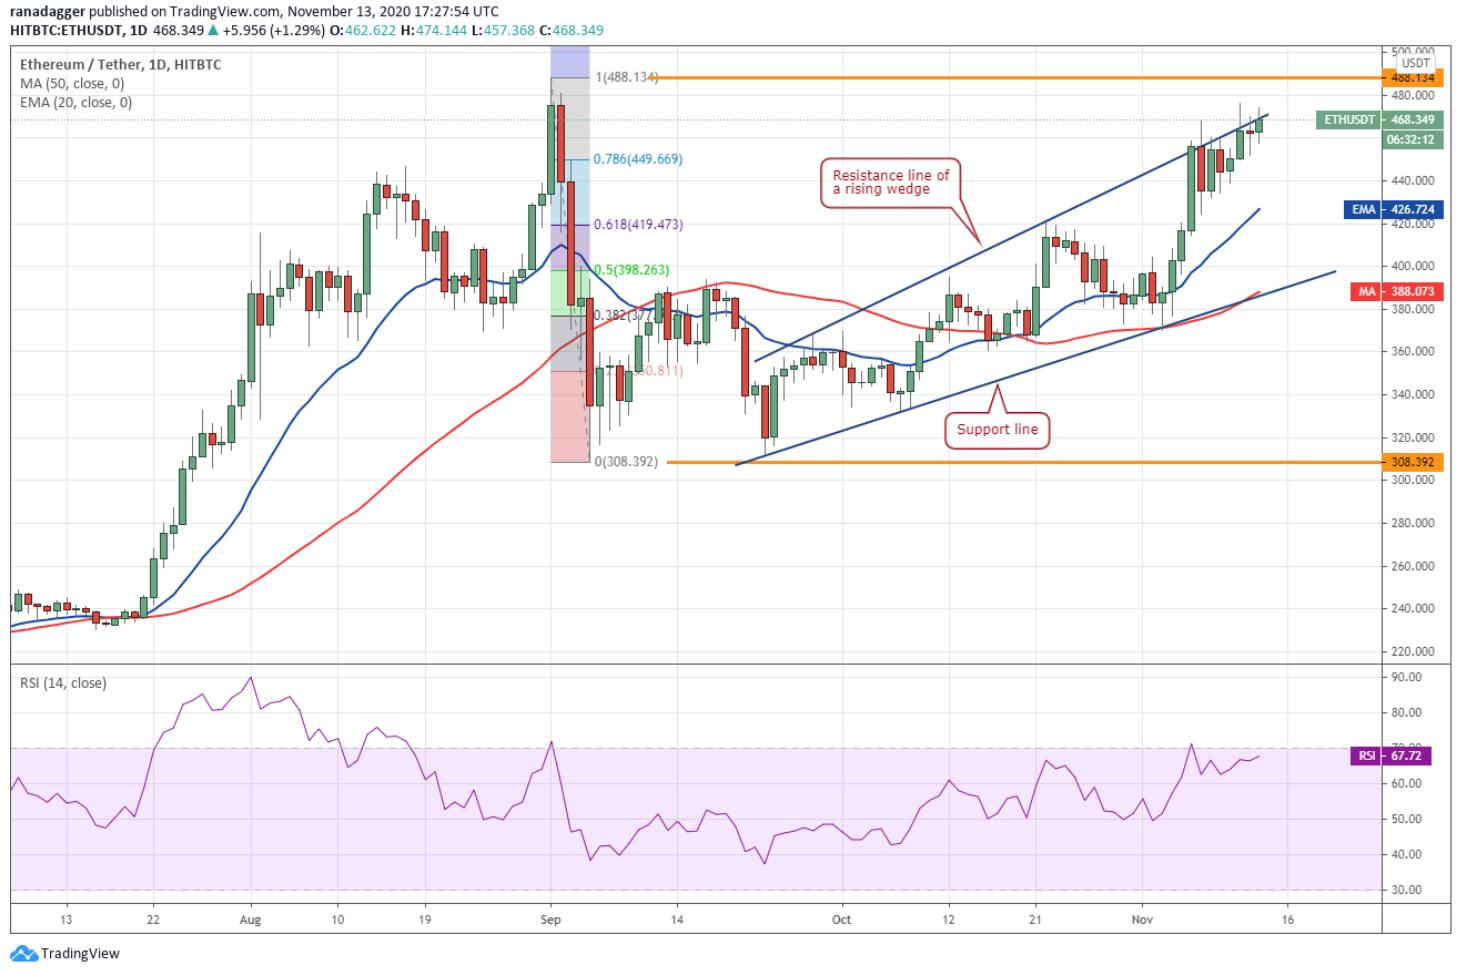 Bitcoin Cash/US Dollar FX Spot Rate, FX Spot Rate, COMPOSITE DISPLAY